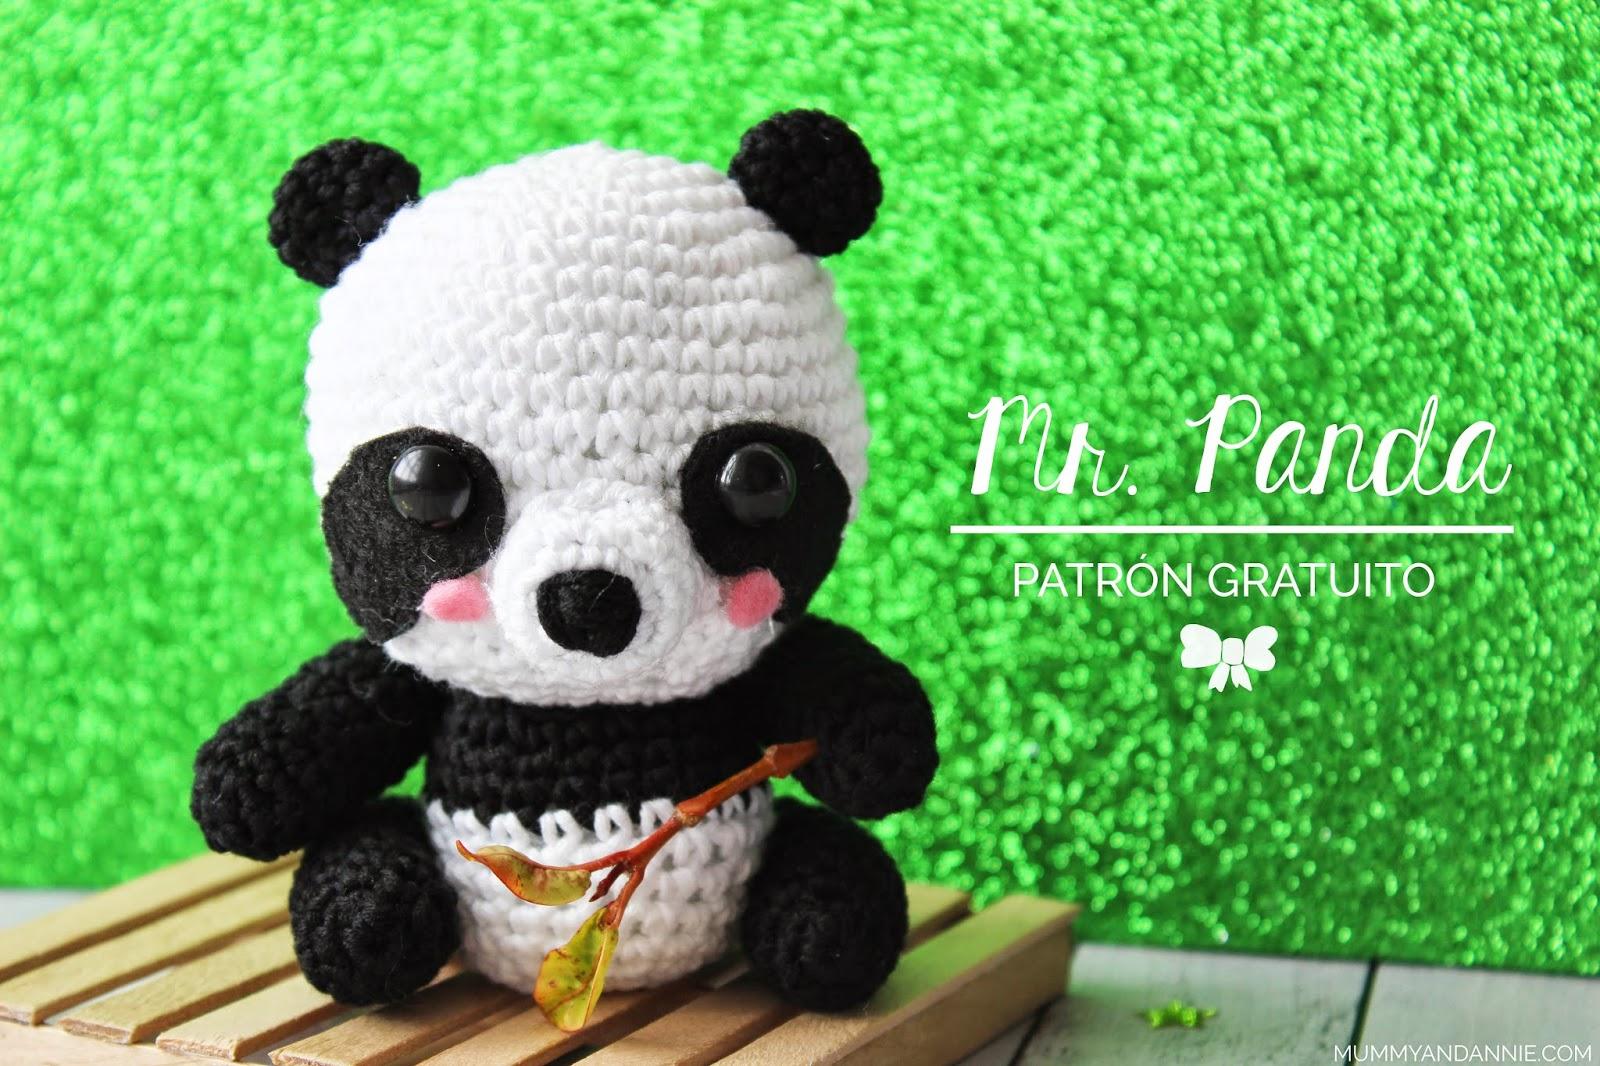 Amigurumi Oso Panda Patron : Mummy and annie mr panda patrÓn gratis